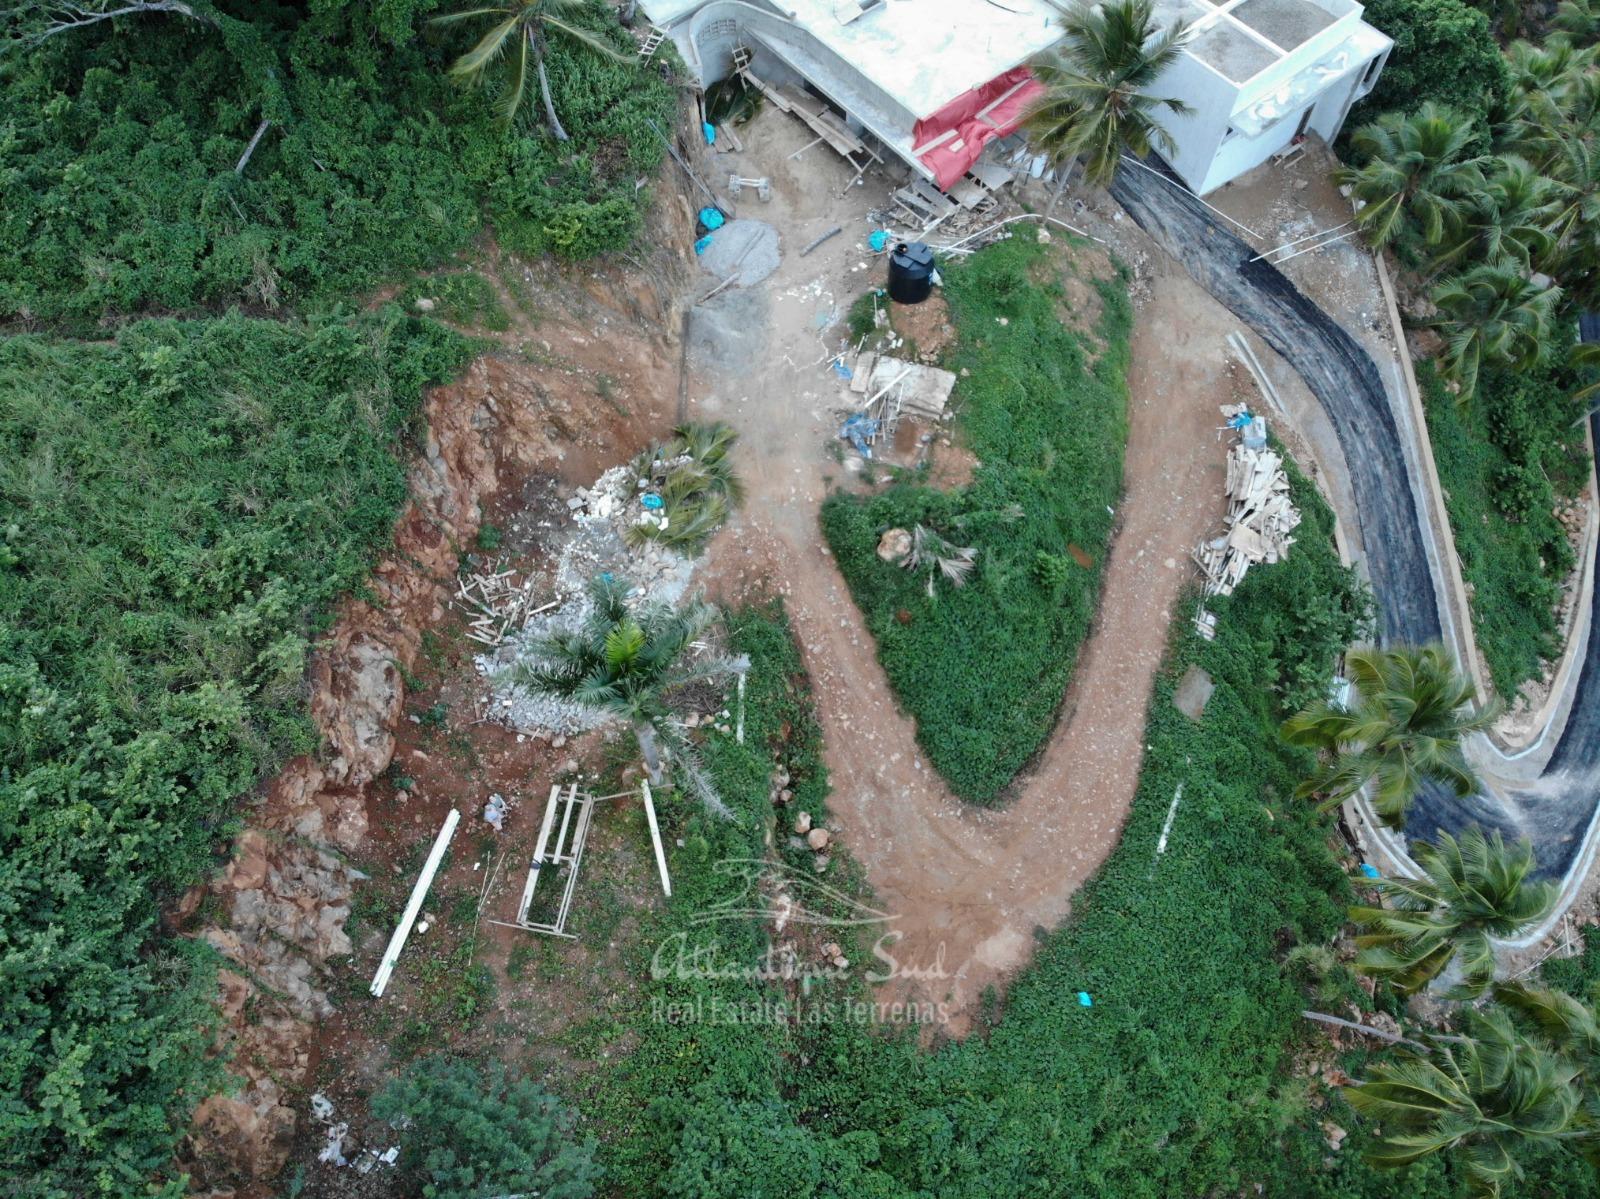 Esperanza Hill lot for sale las terrenas1.jpeg